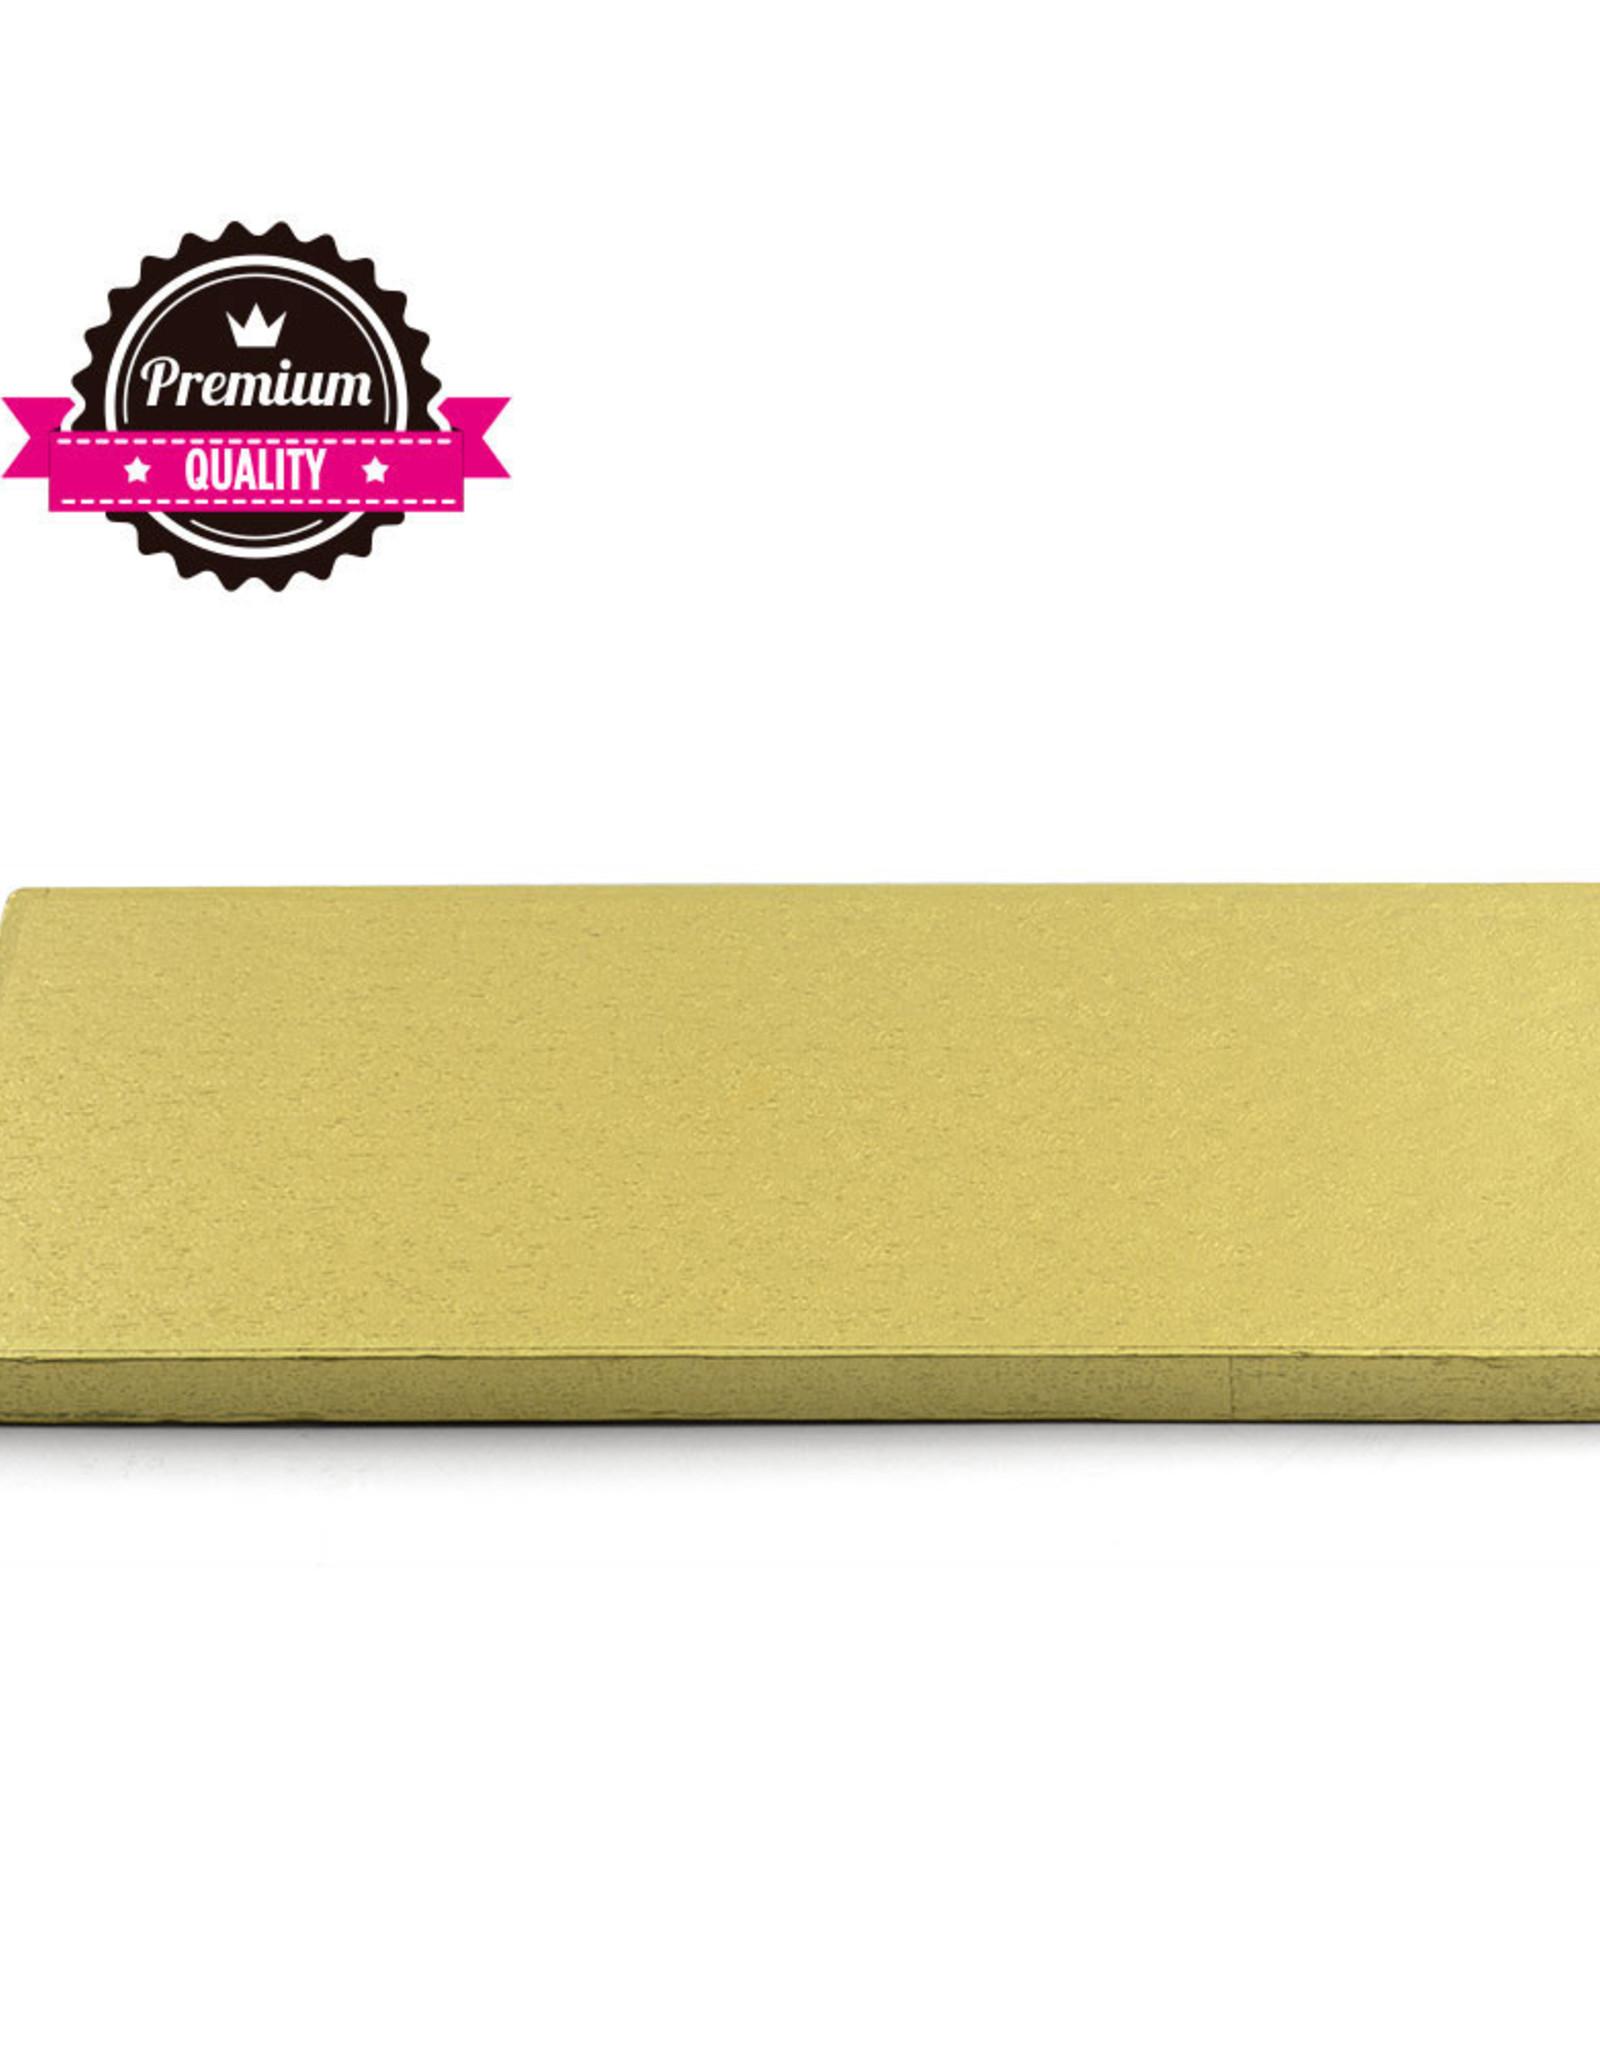 Cake Drum Rechthoek 50x40cm Gold